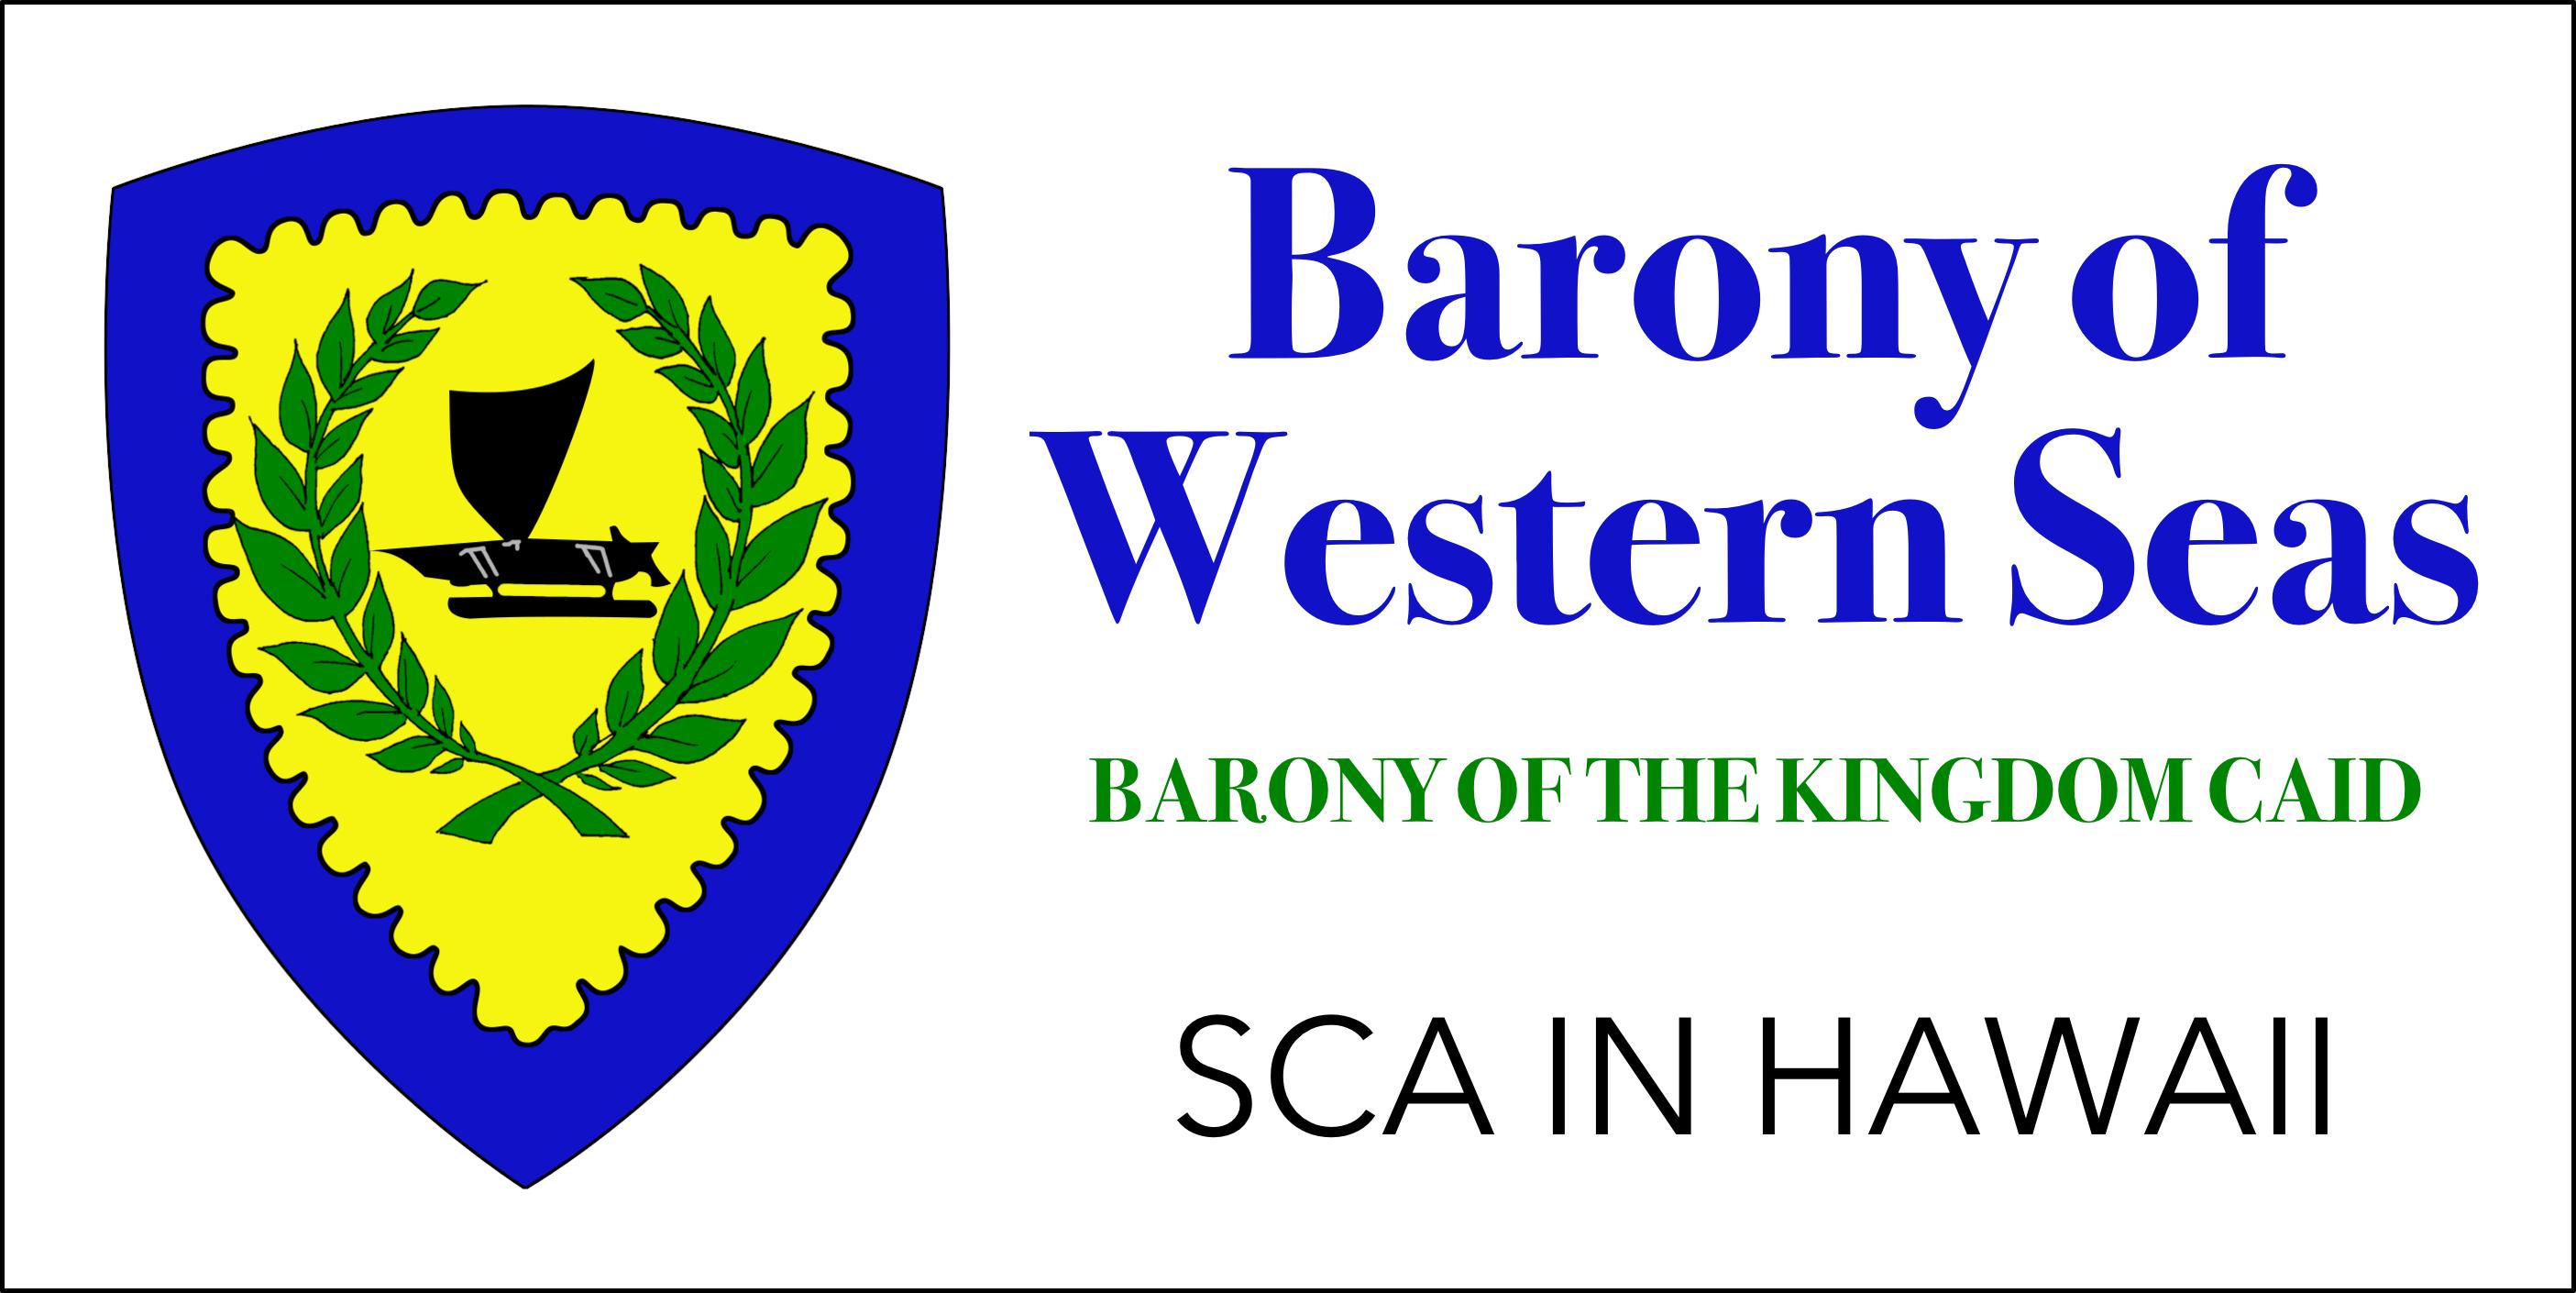 Barony of Western Seas